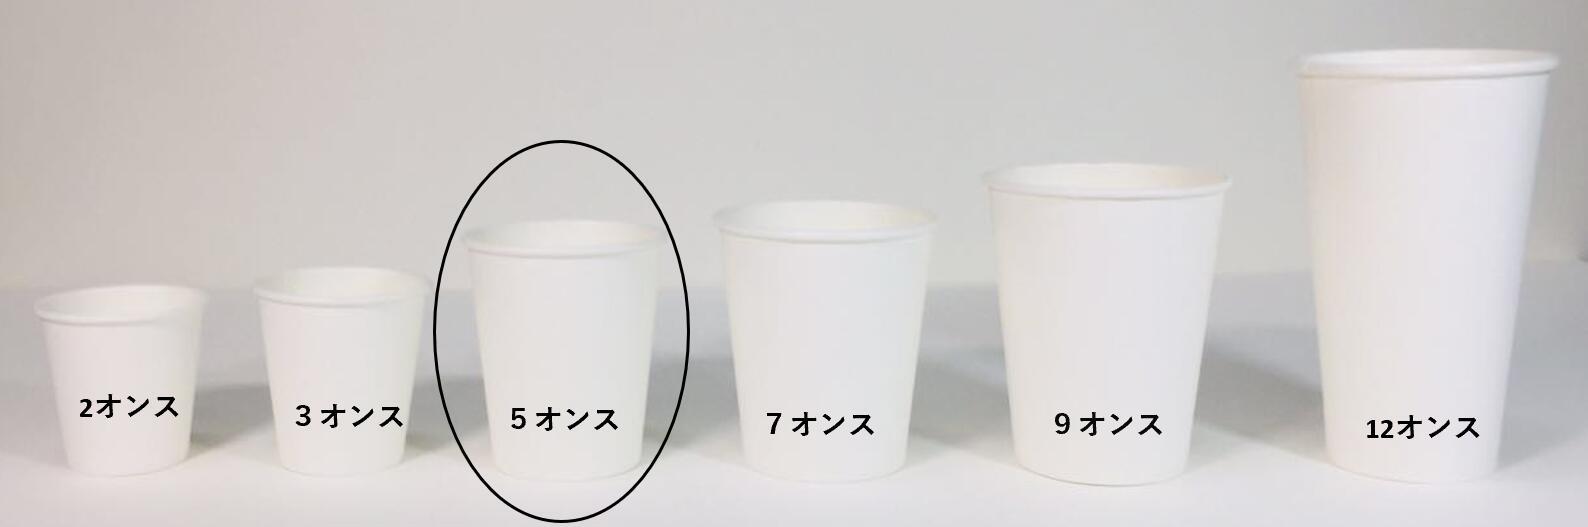 送料無料 北海道 沖縄除く 50x2列 祝開店大放出セール開催中 100個x30袋 返品不可 3000個 紙コップ5オンス3000個